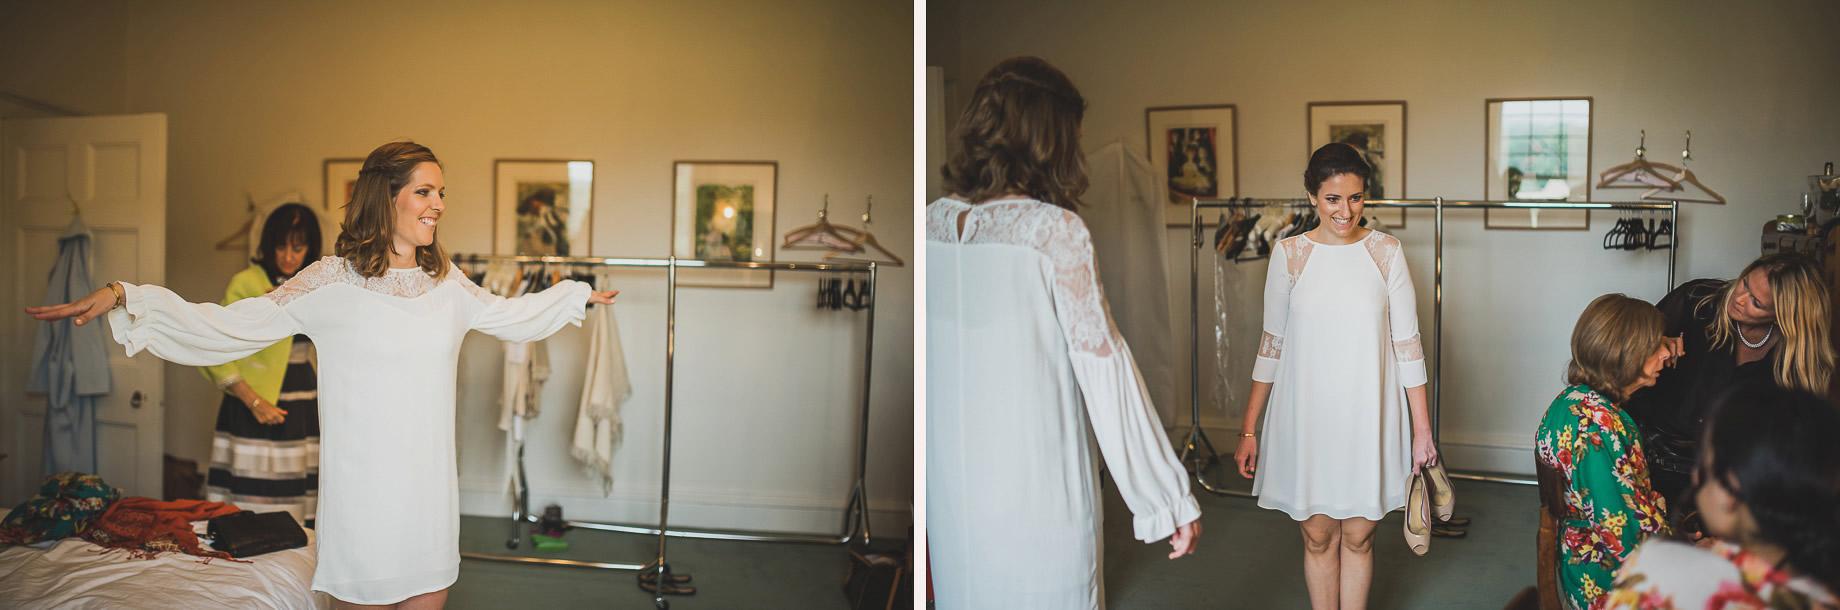 Julia and Simon's Wedding at Yealand Manor 019